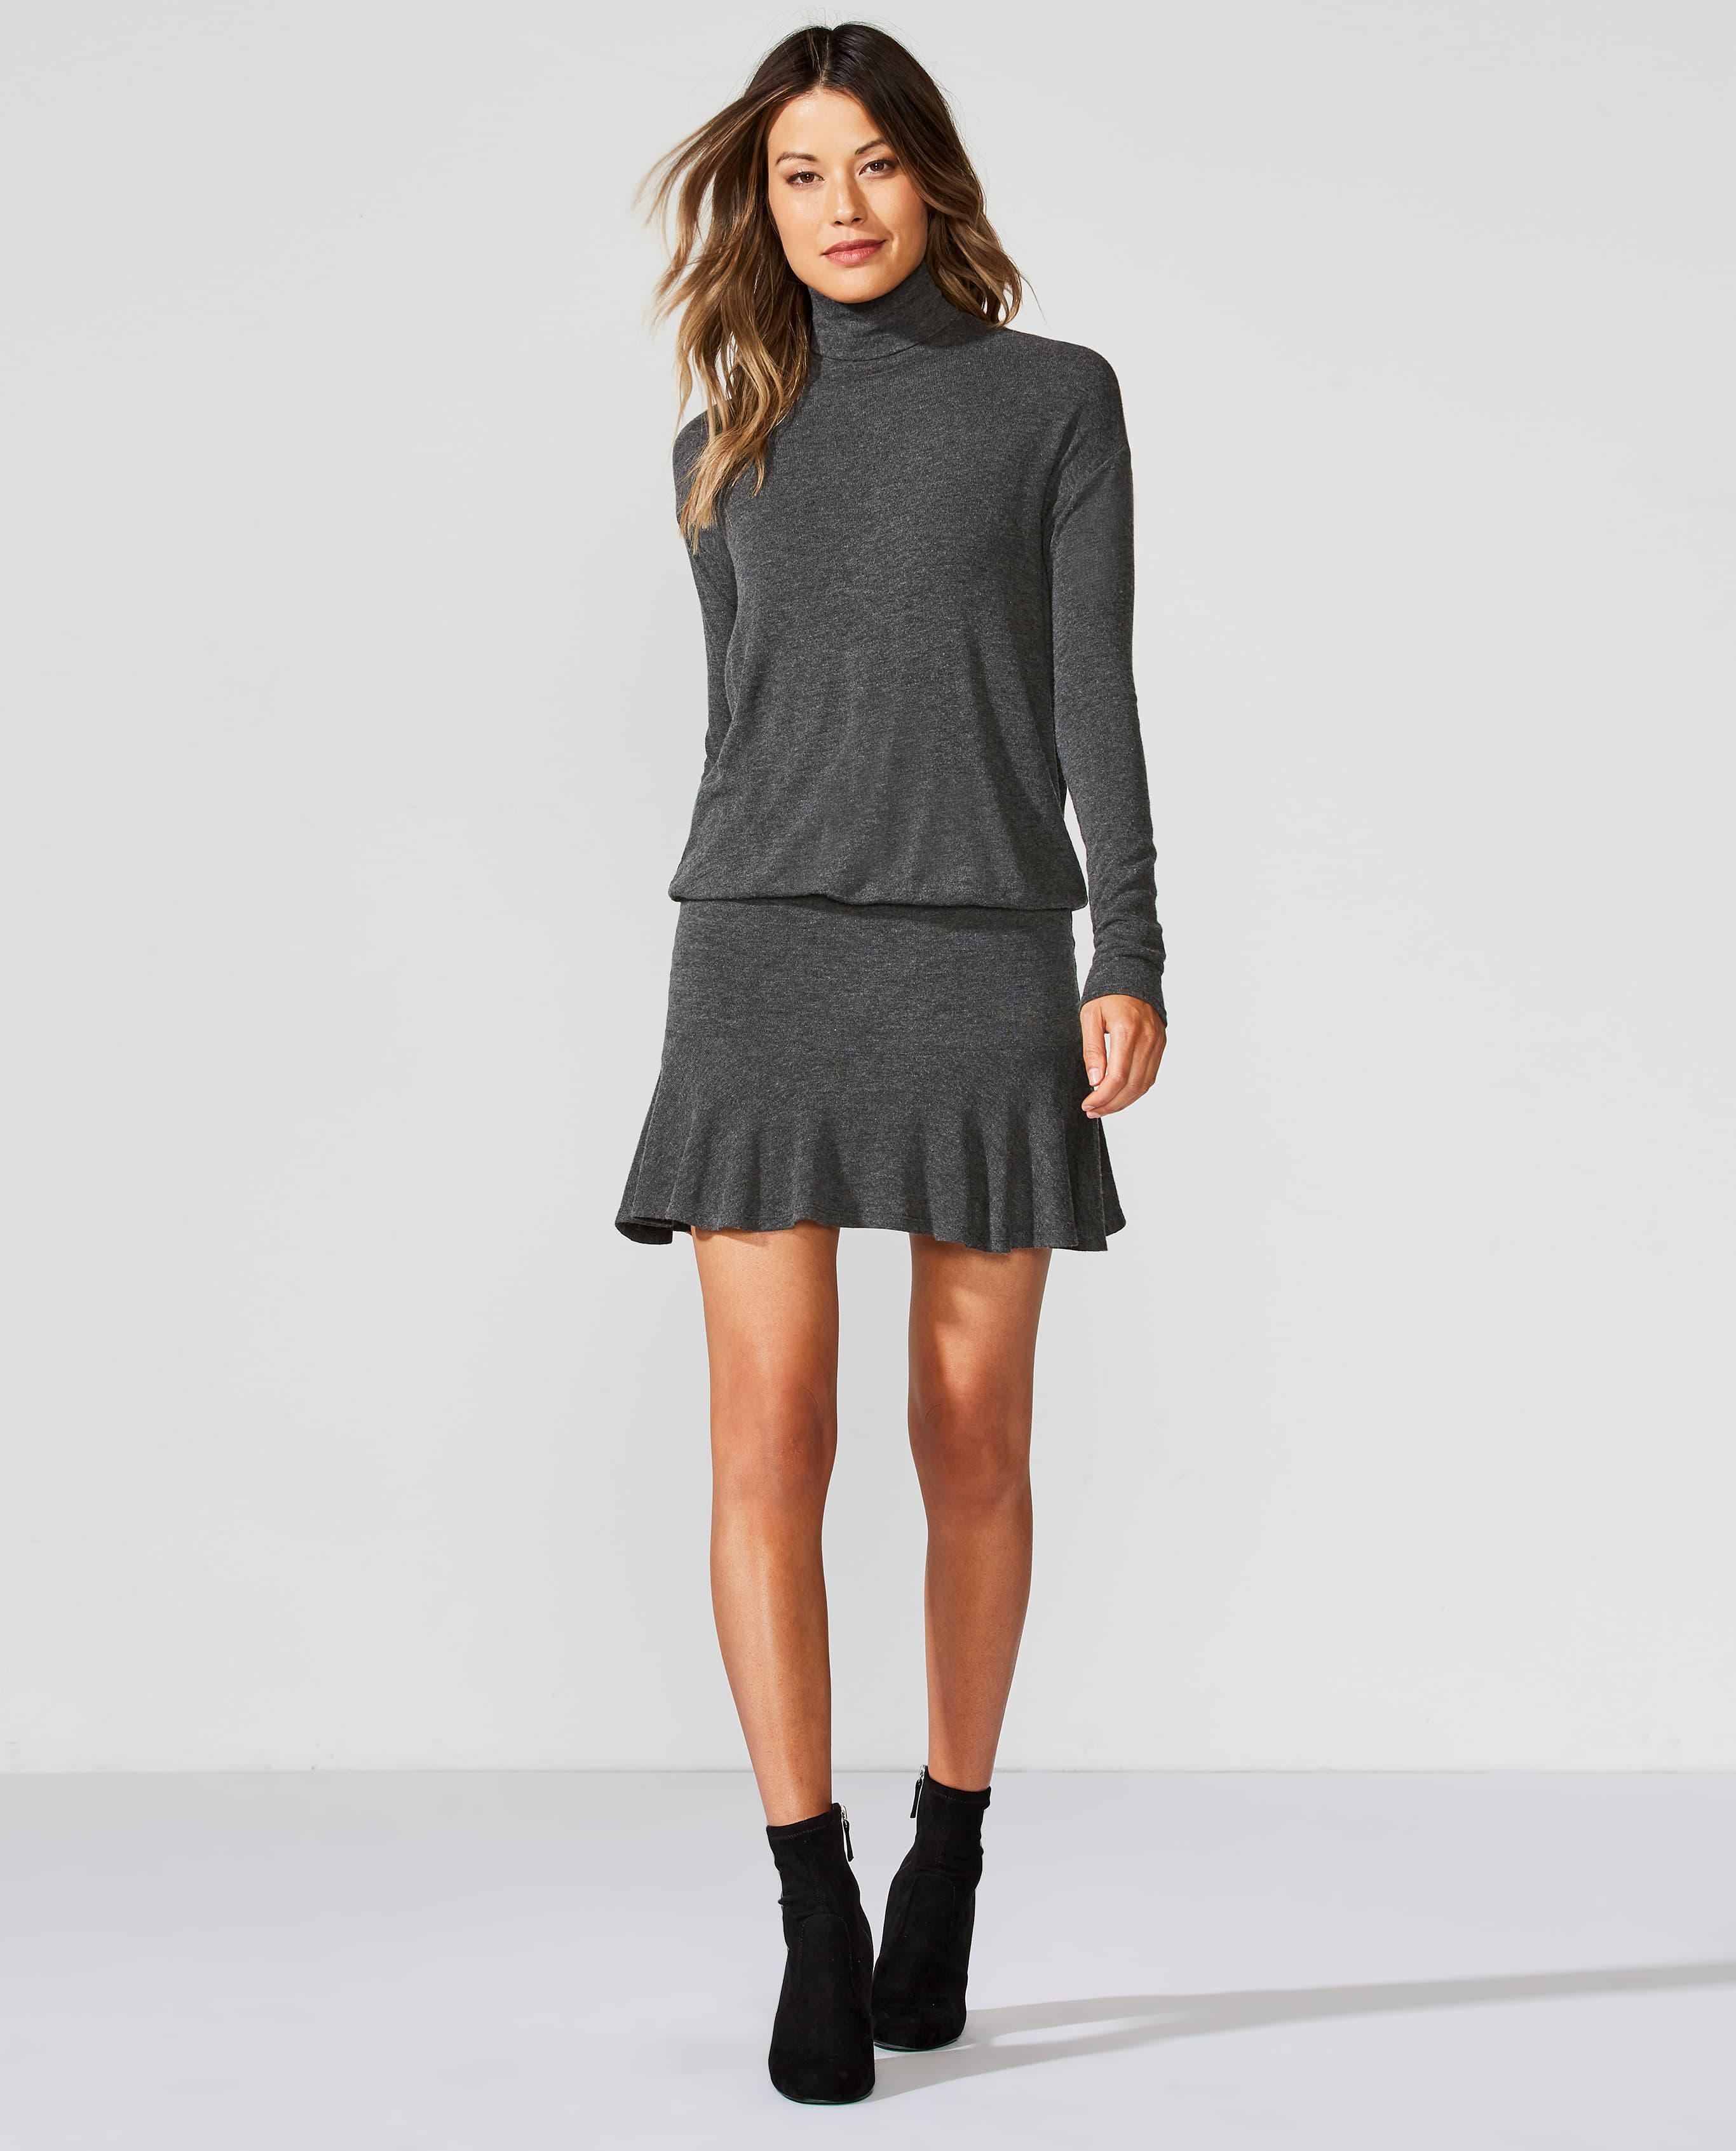 Bailey 44 Anastasia Ruffle-Hem Sweaterdress